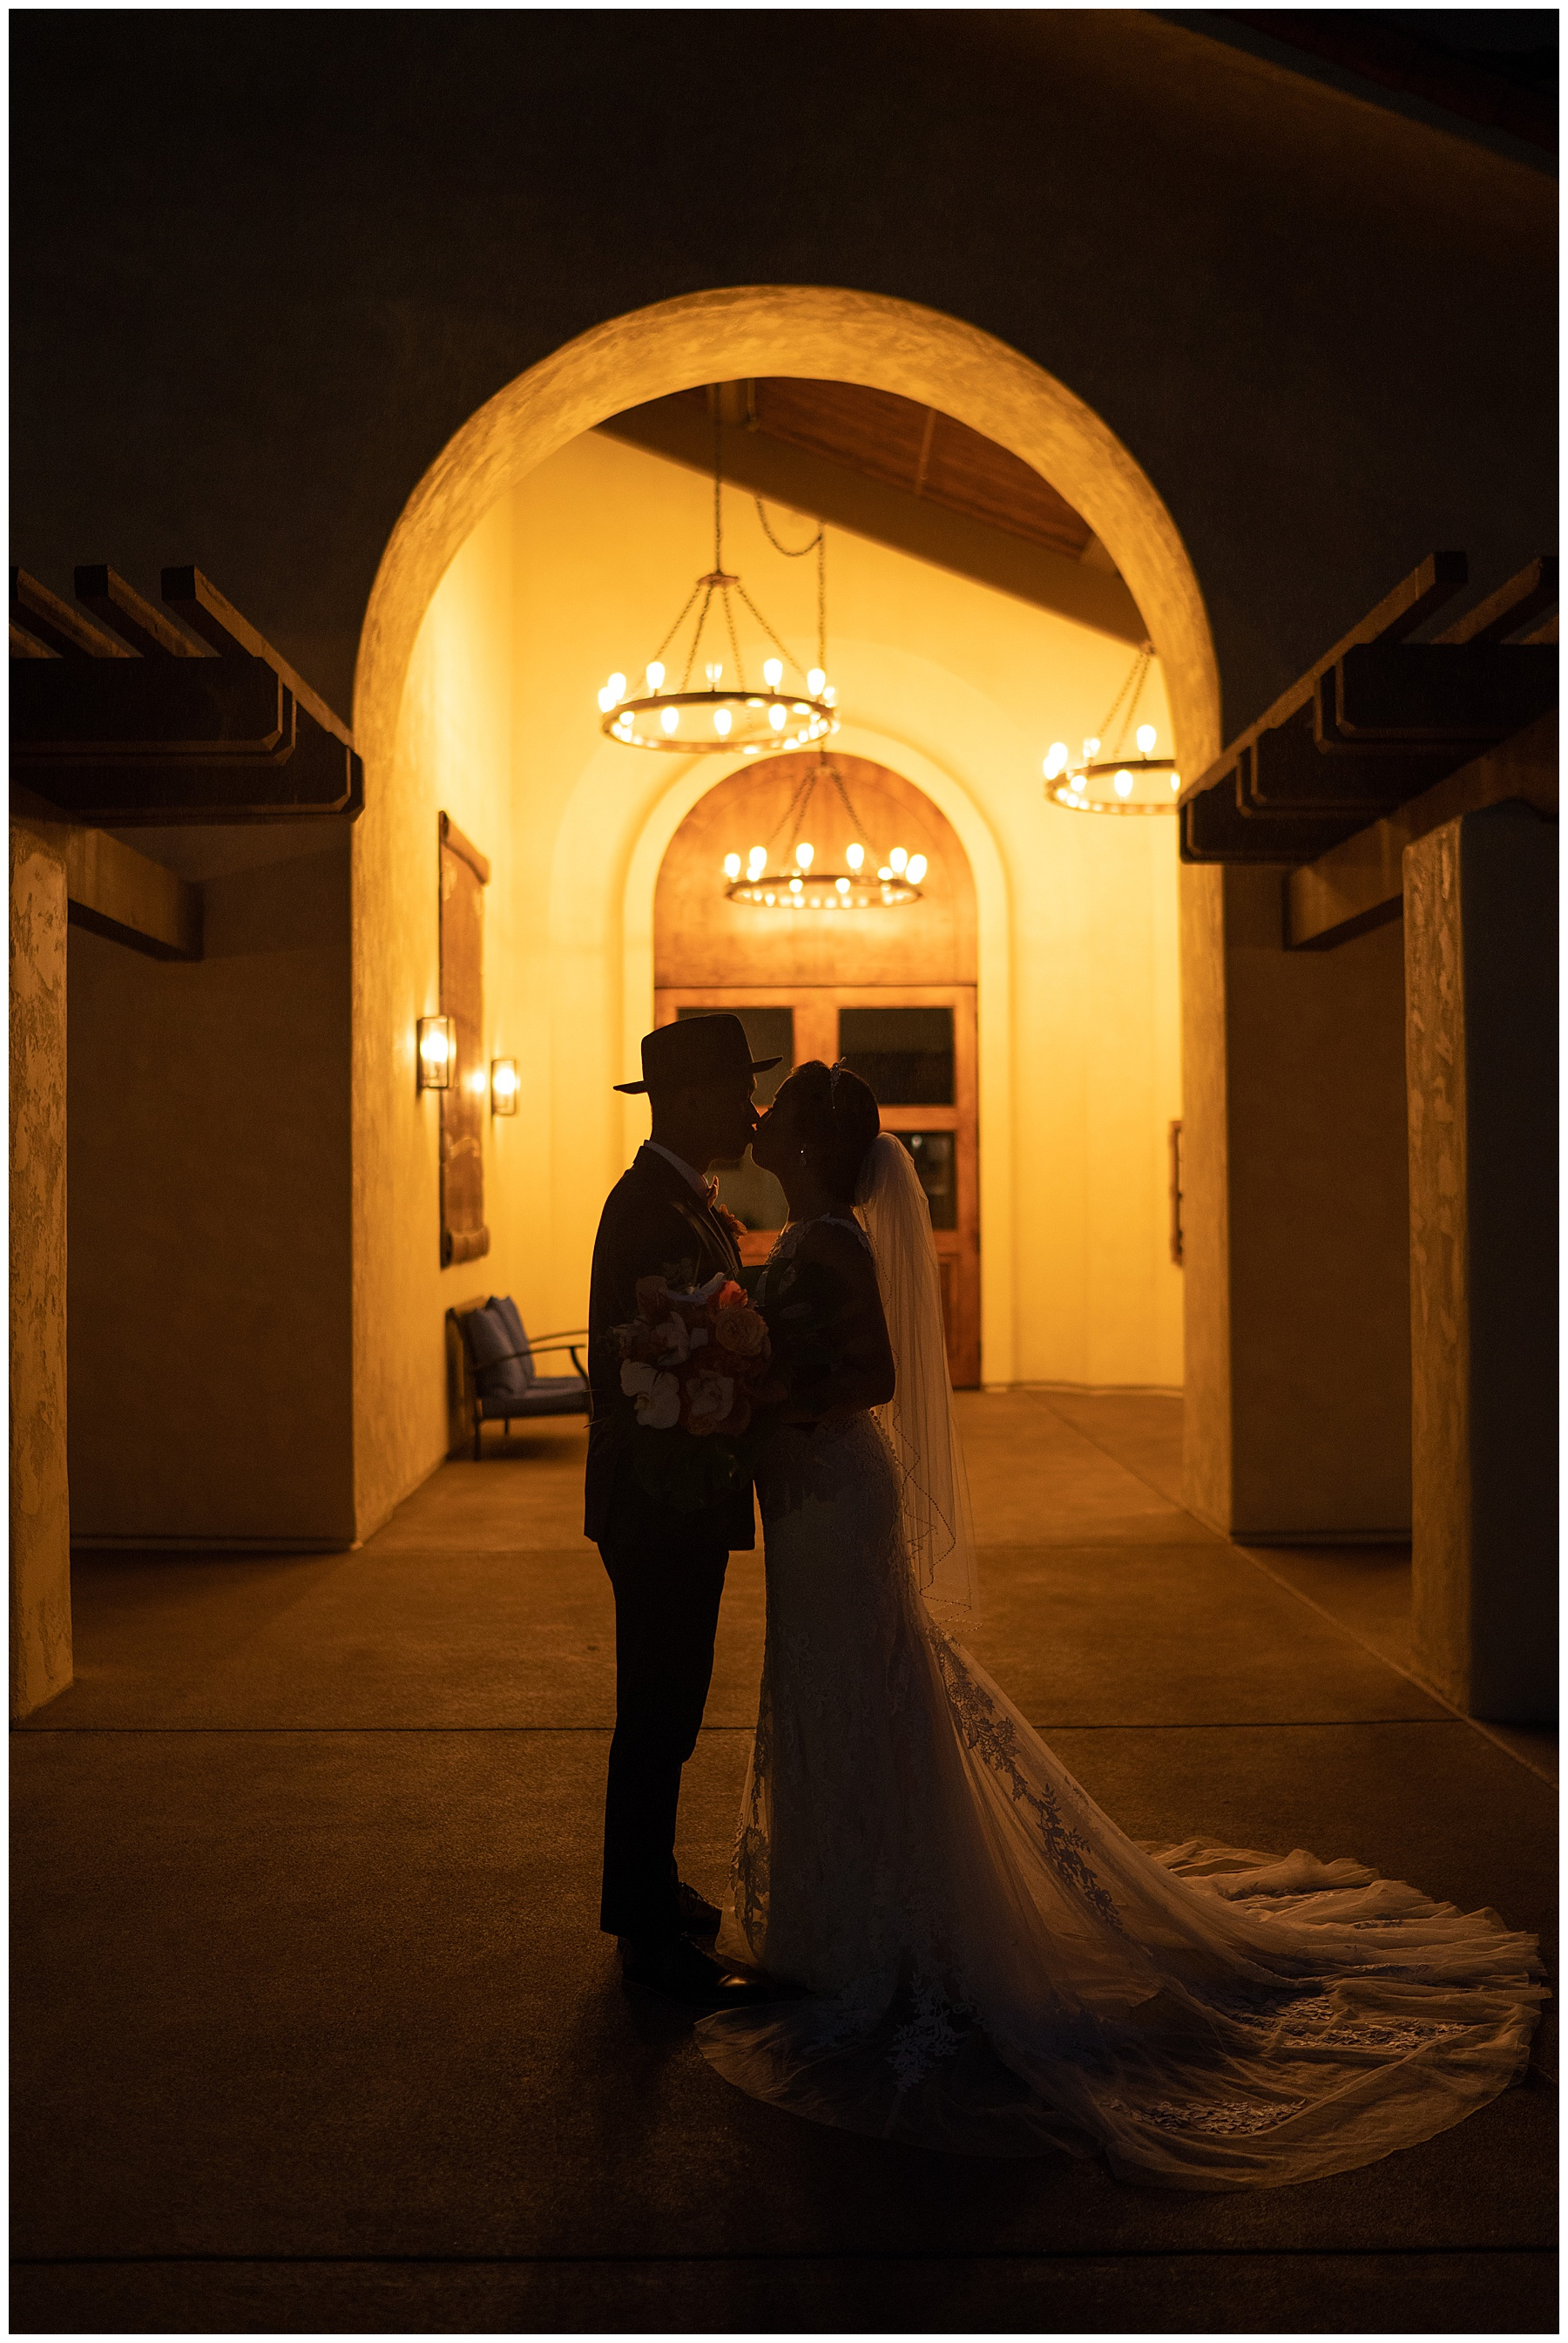 bride and groom silhouette tom ham's lighthouse wedding